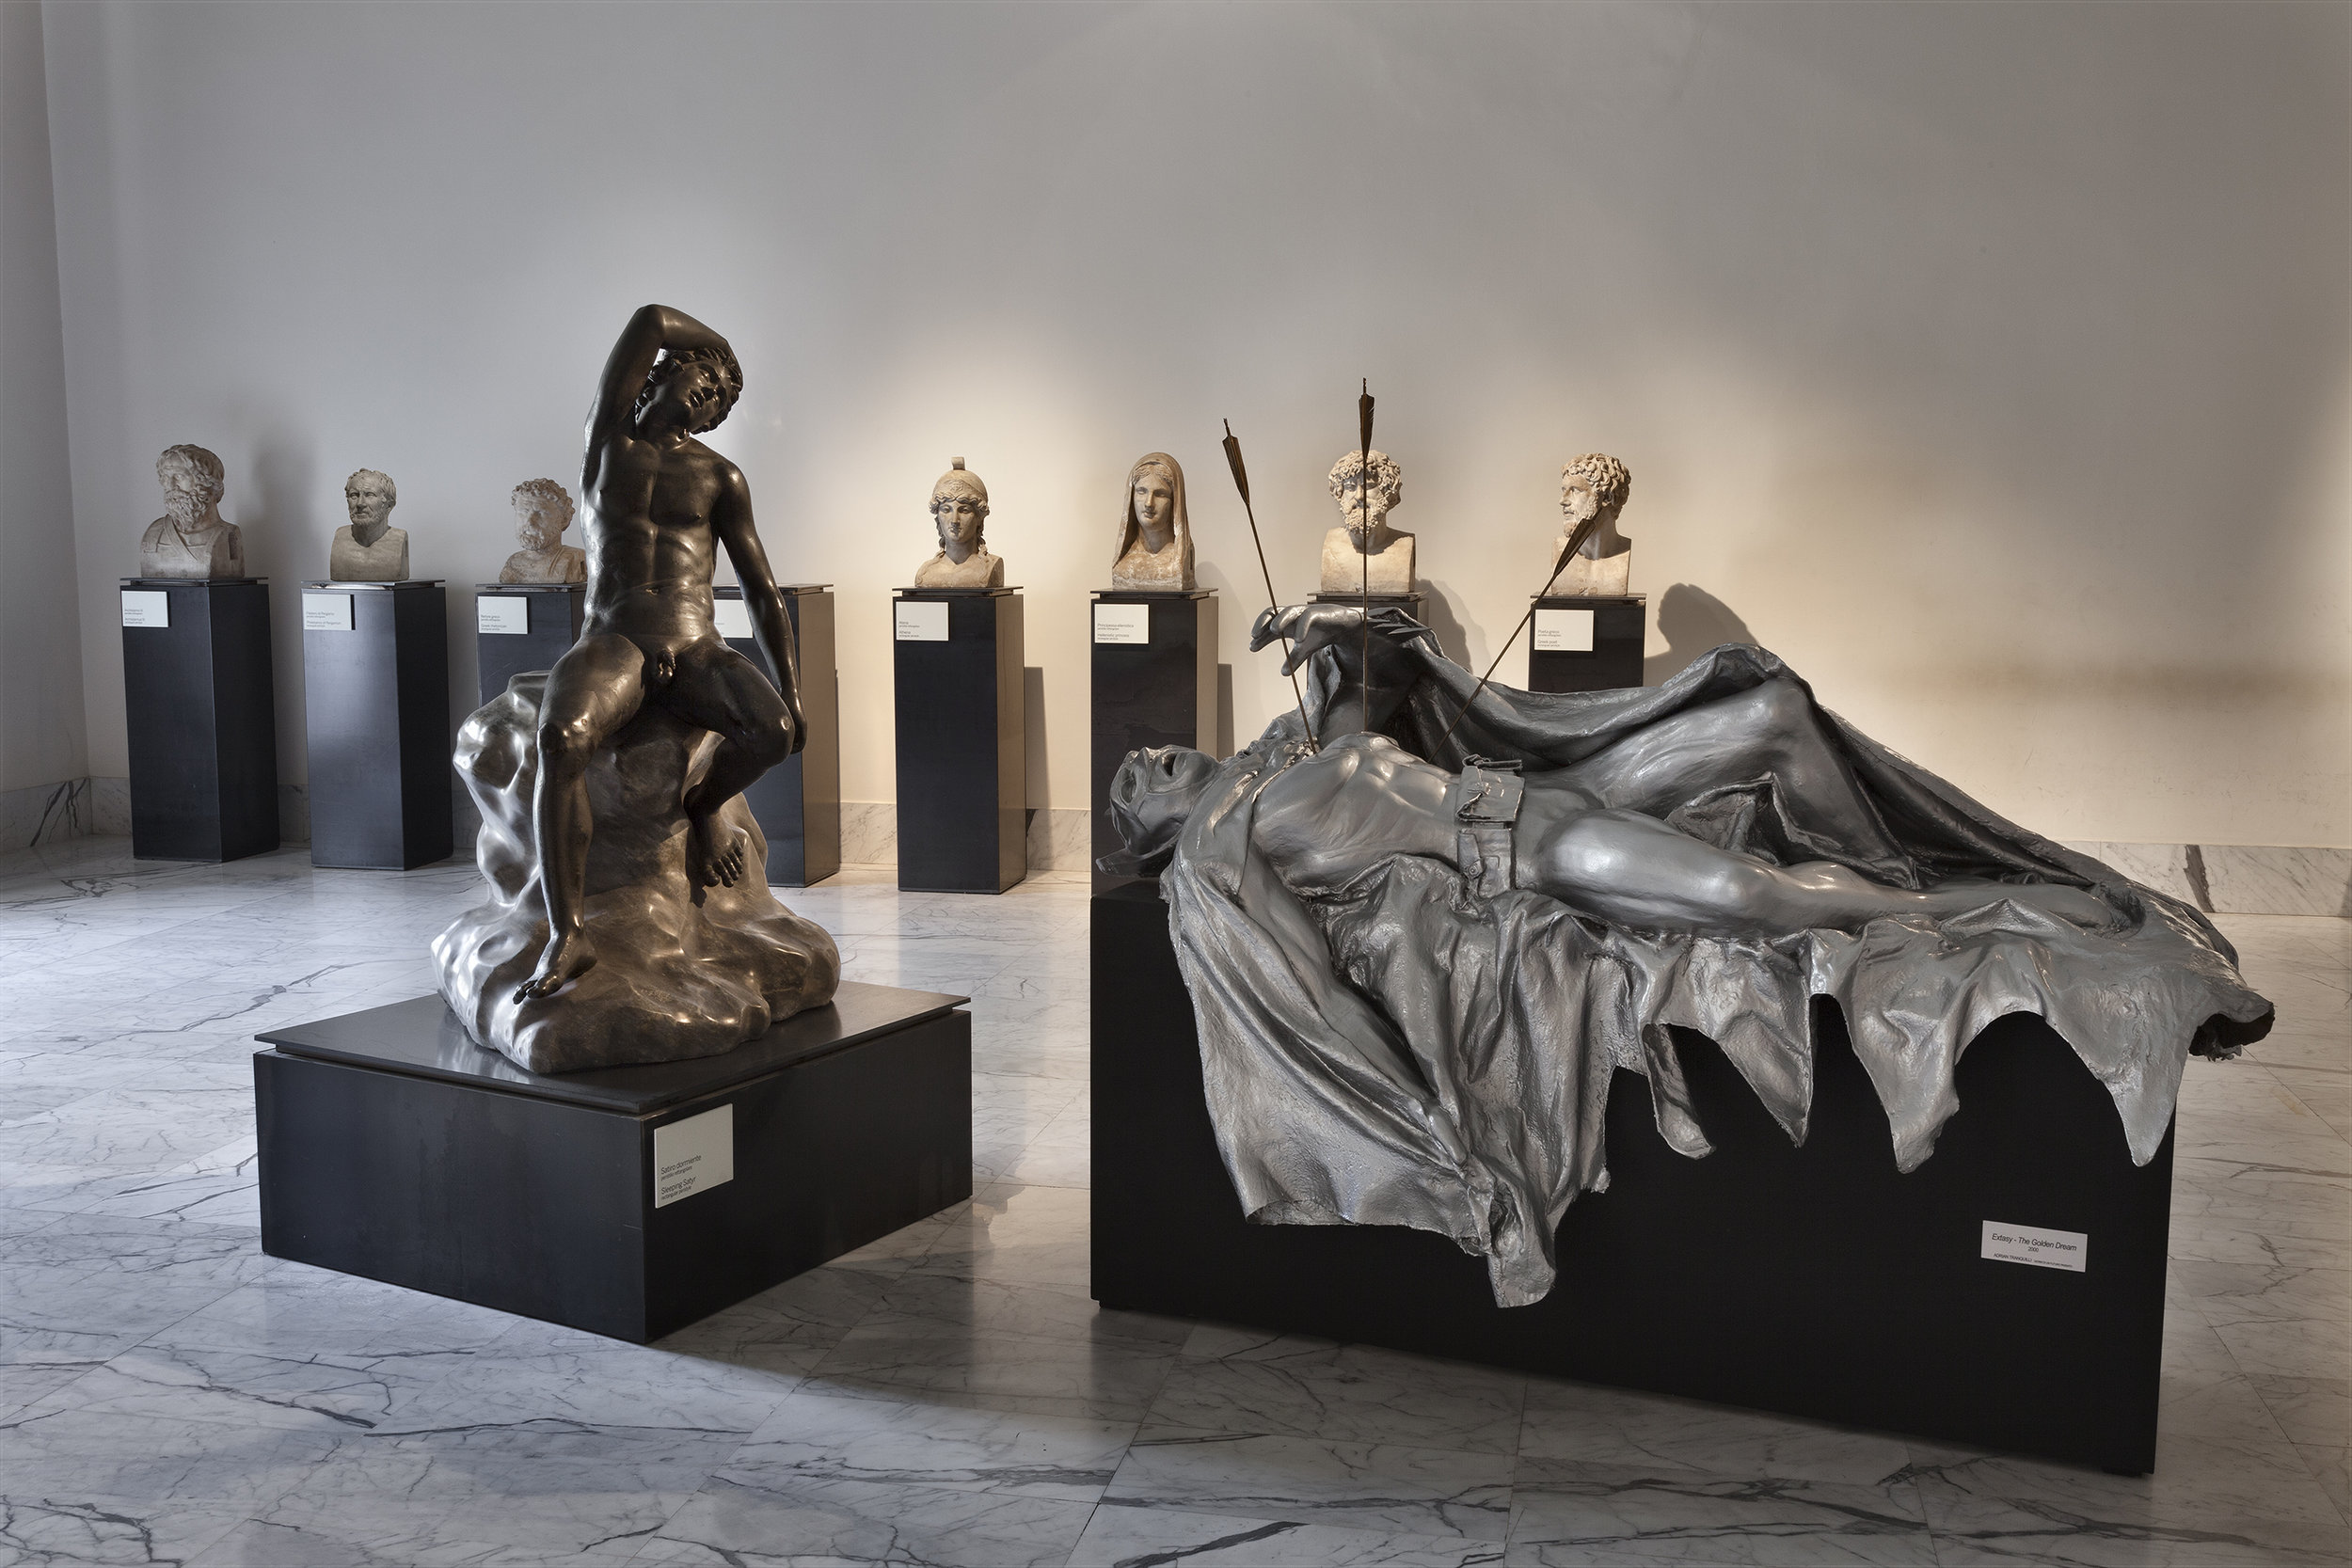 EXTASY - The Golden Dream , 2000 . MANN - Museo Archeologico Nazionale di Napoli, Naples 2016. Installation view. Photo: Claudio Abate